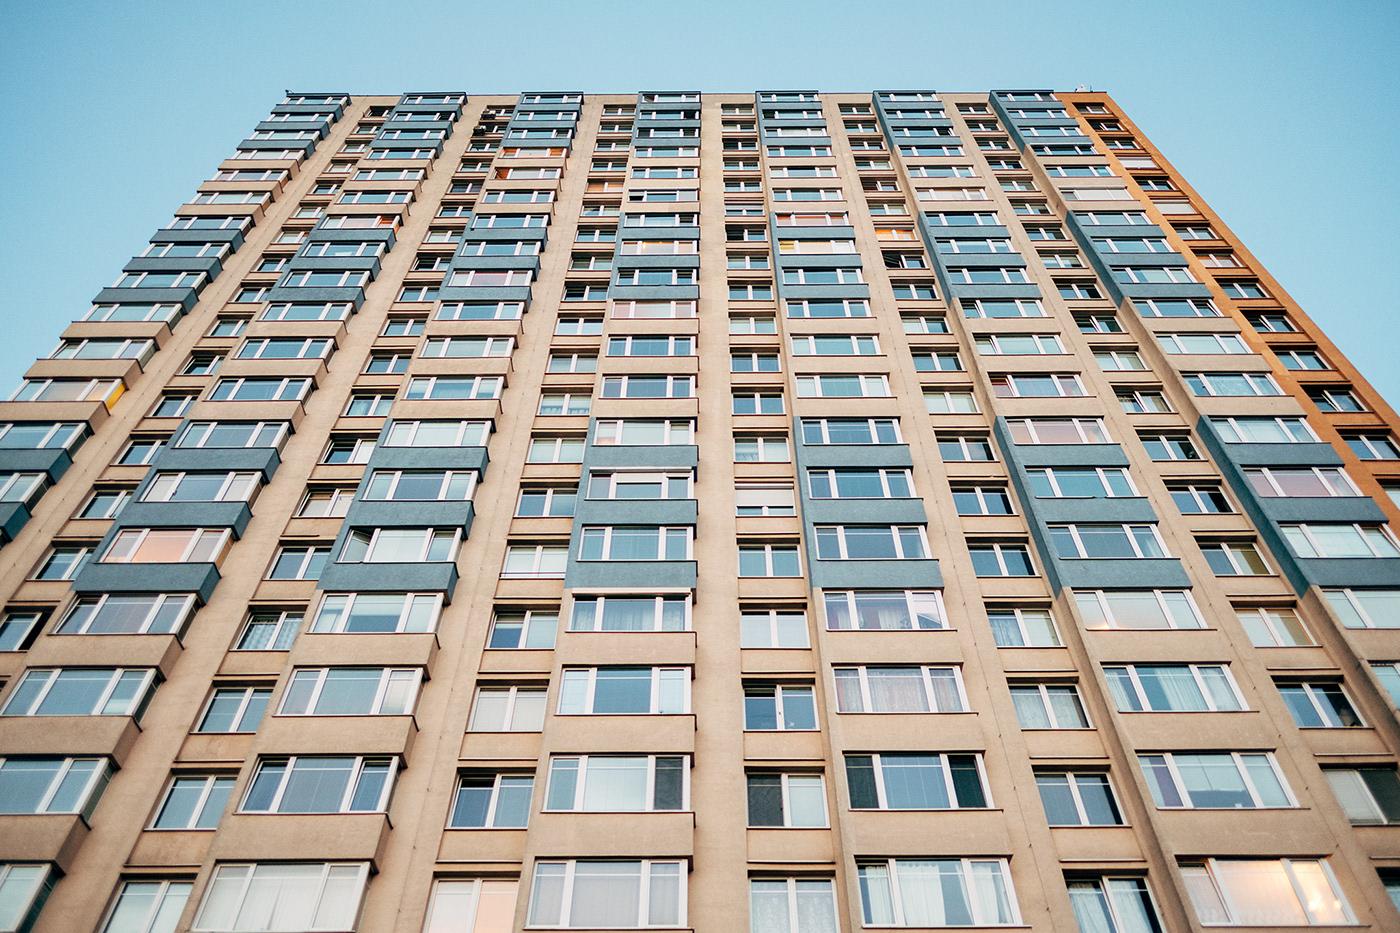 neighbourhood postcommunism architecture fashionstory Czech Republic Urban concrete